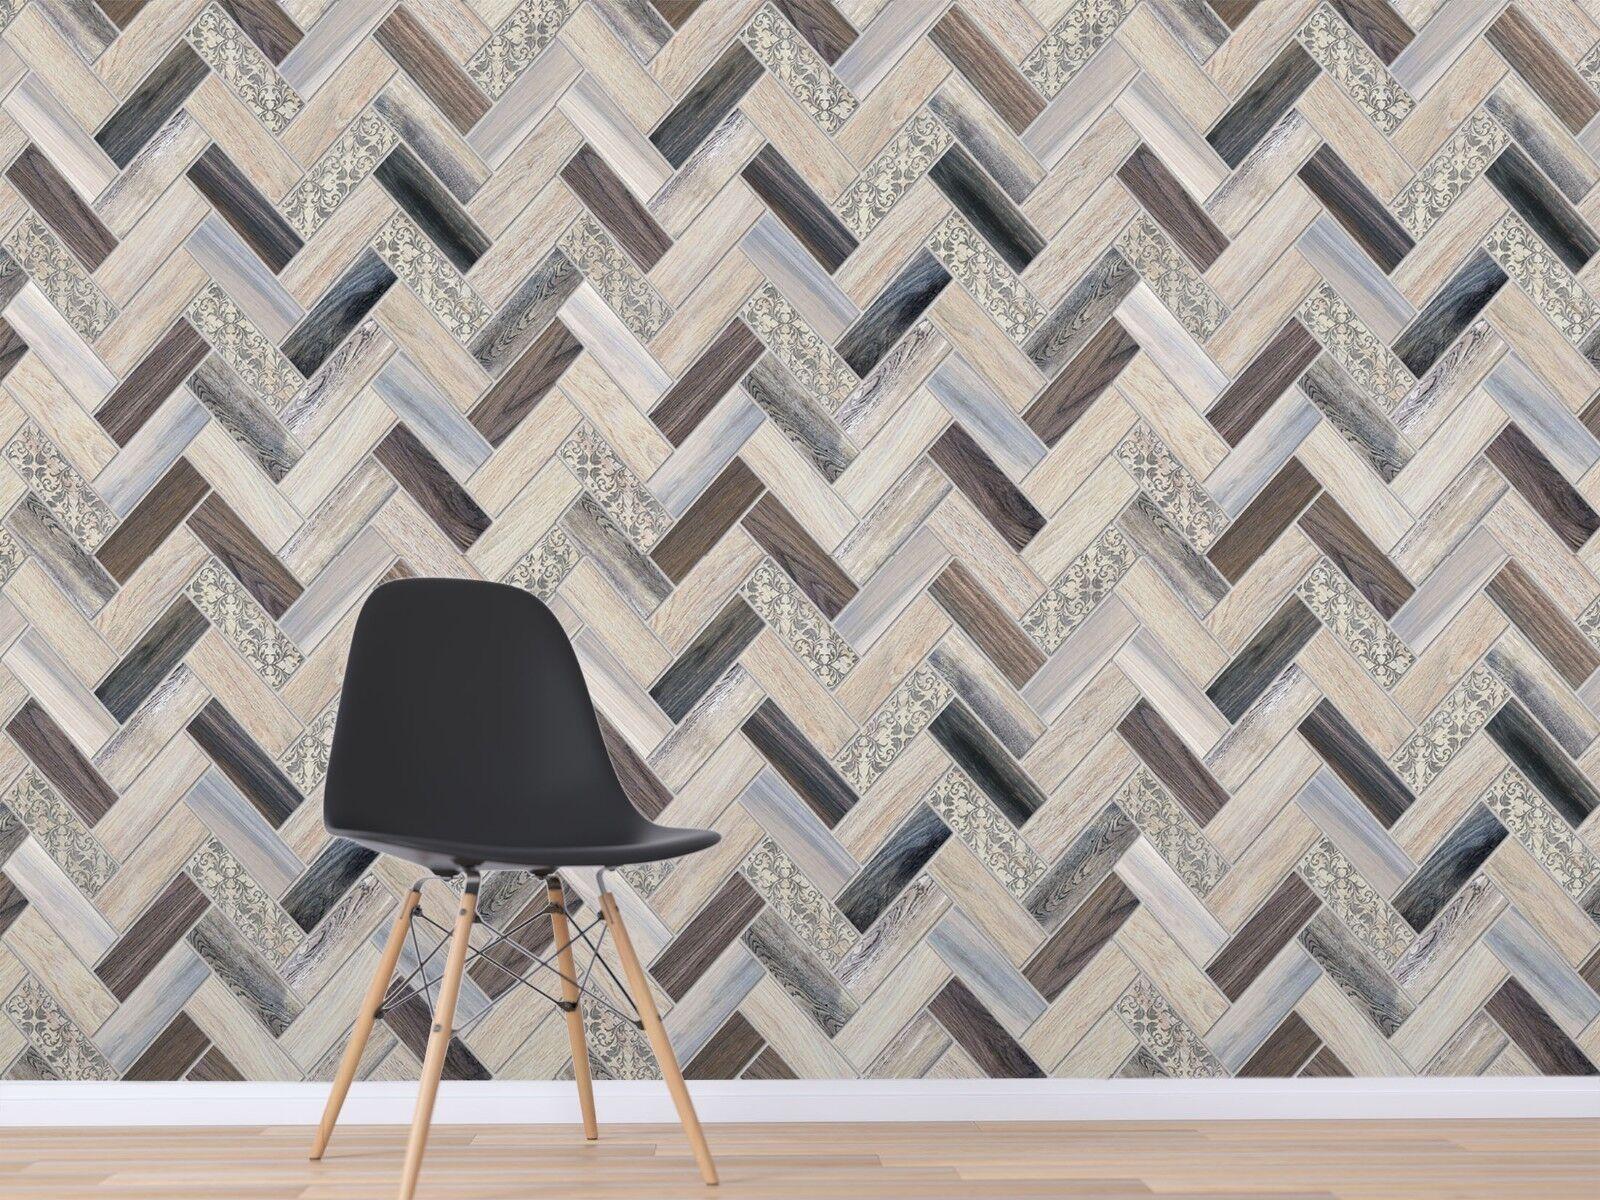 3D Wooden Board Pattern 3 Texture Tiles Marble Wall Paper Decal Wallpaper Mural